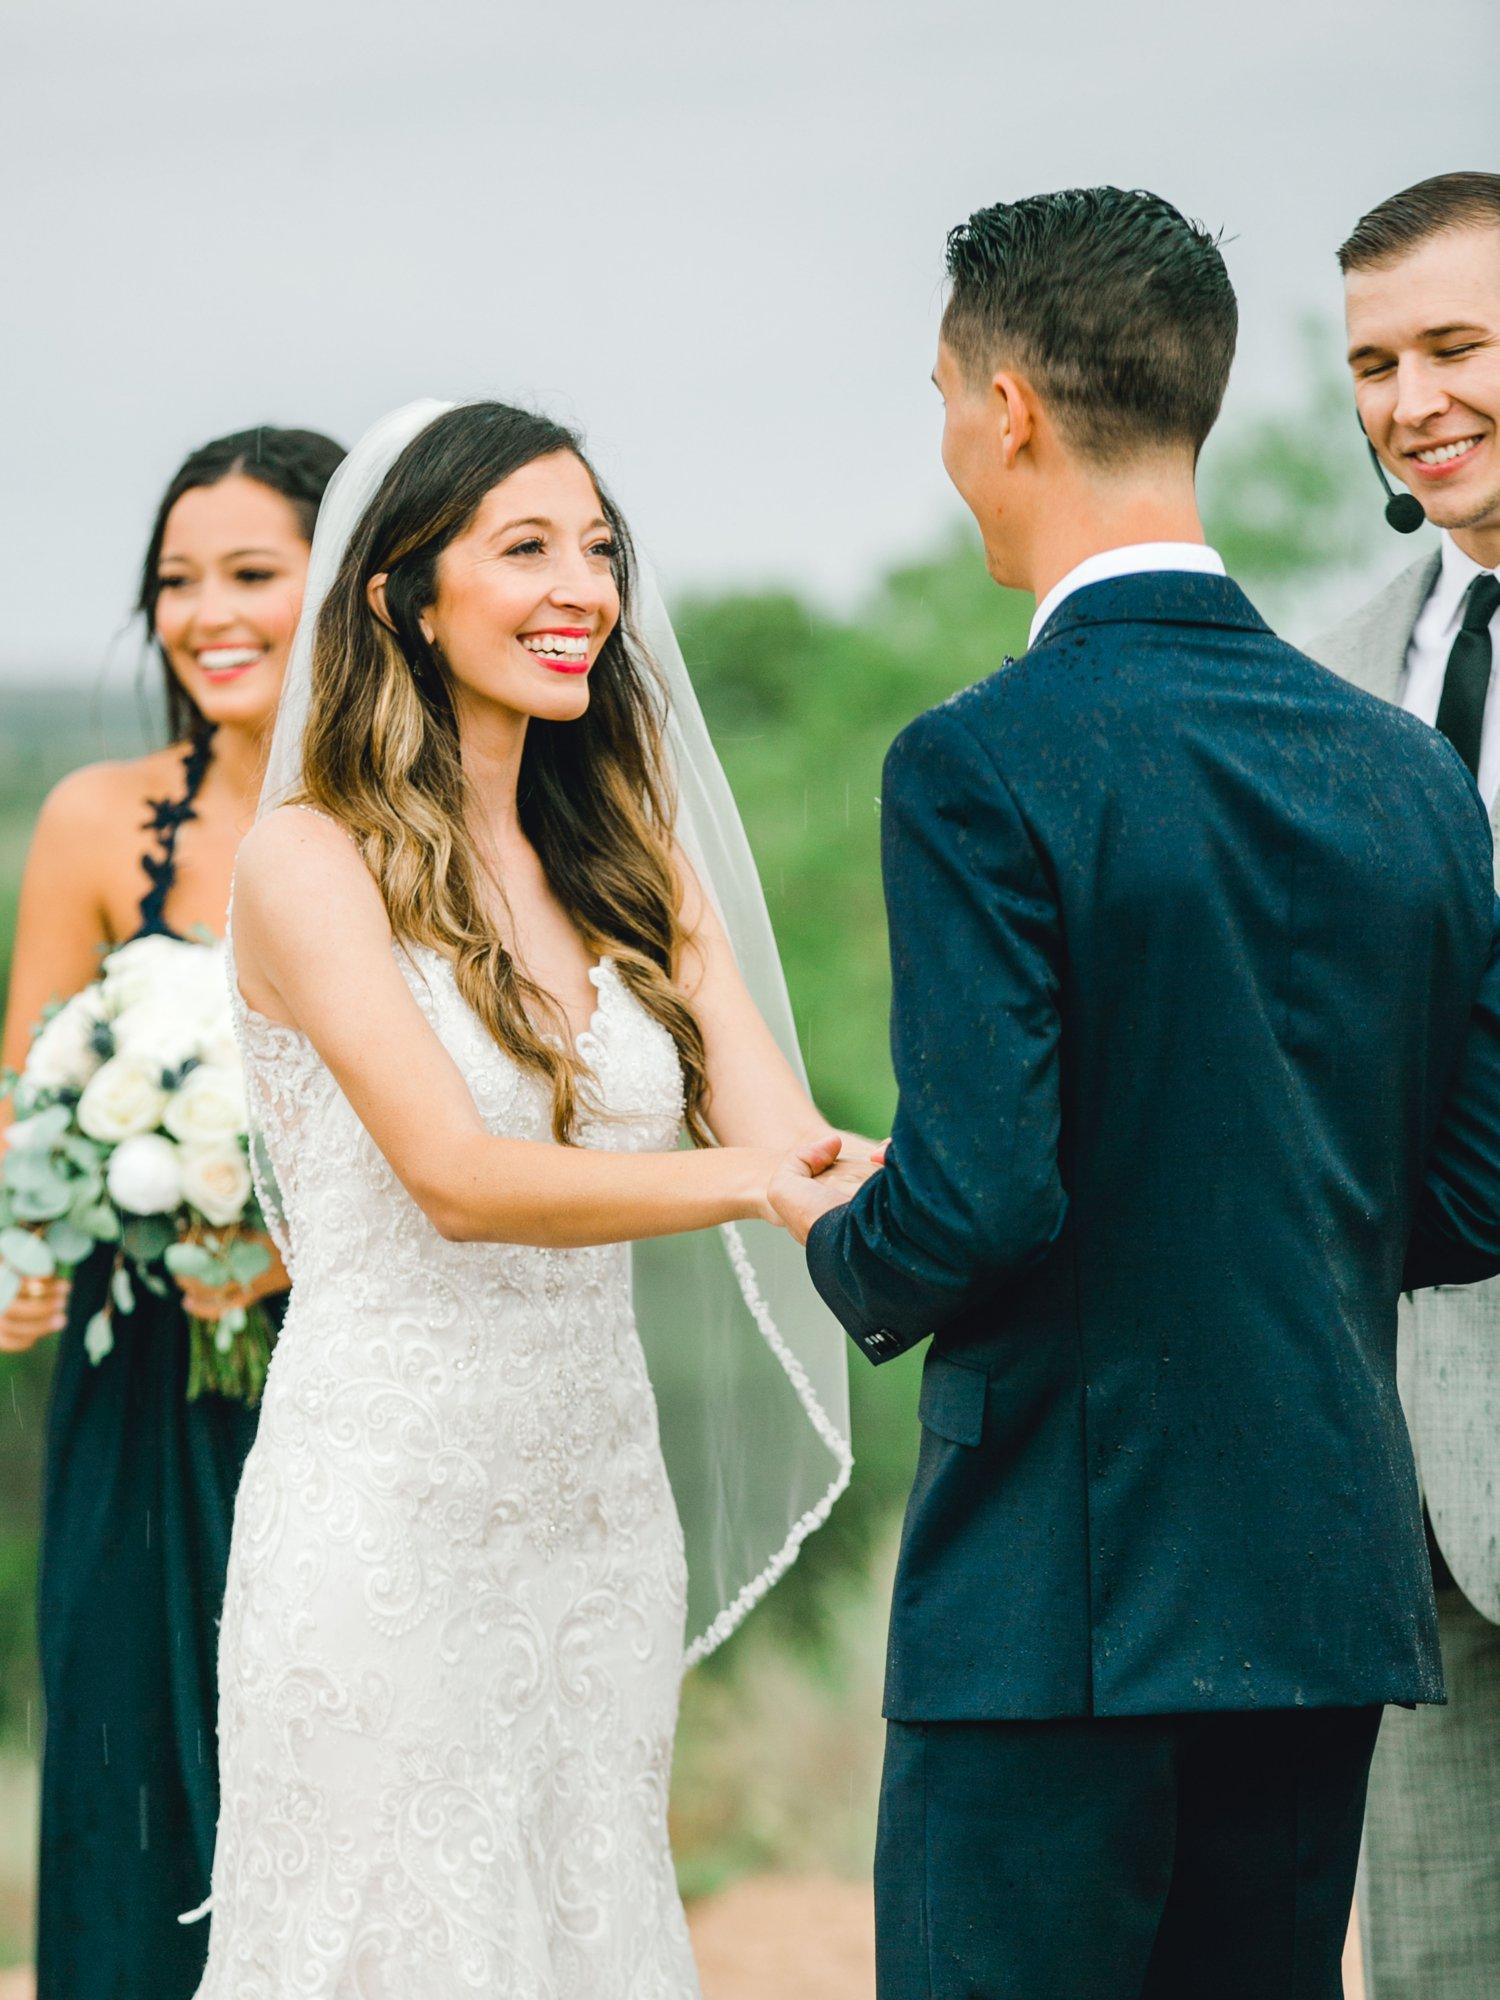 Ashley_John_English_Elegant_Texas_Wedding_Outdoors_Ranch_Caprock_Winery_ALLEEJ_0136.jpg